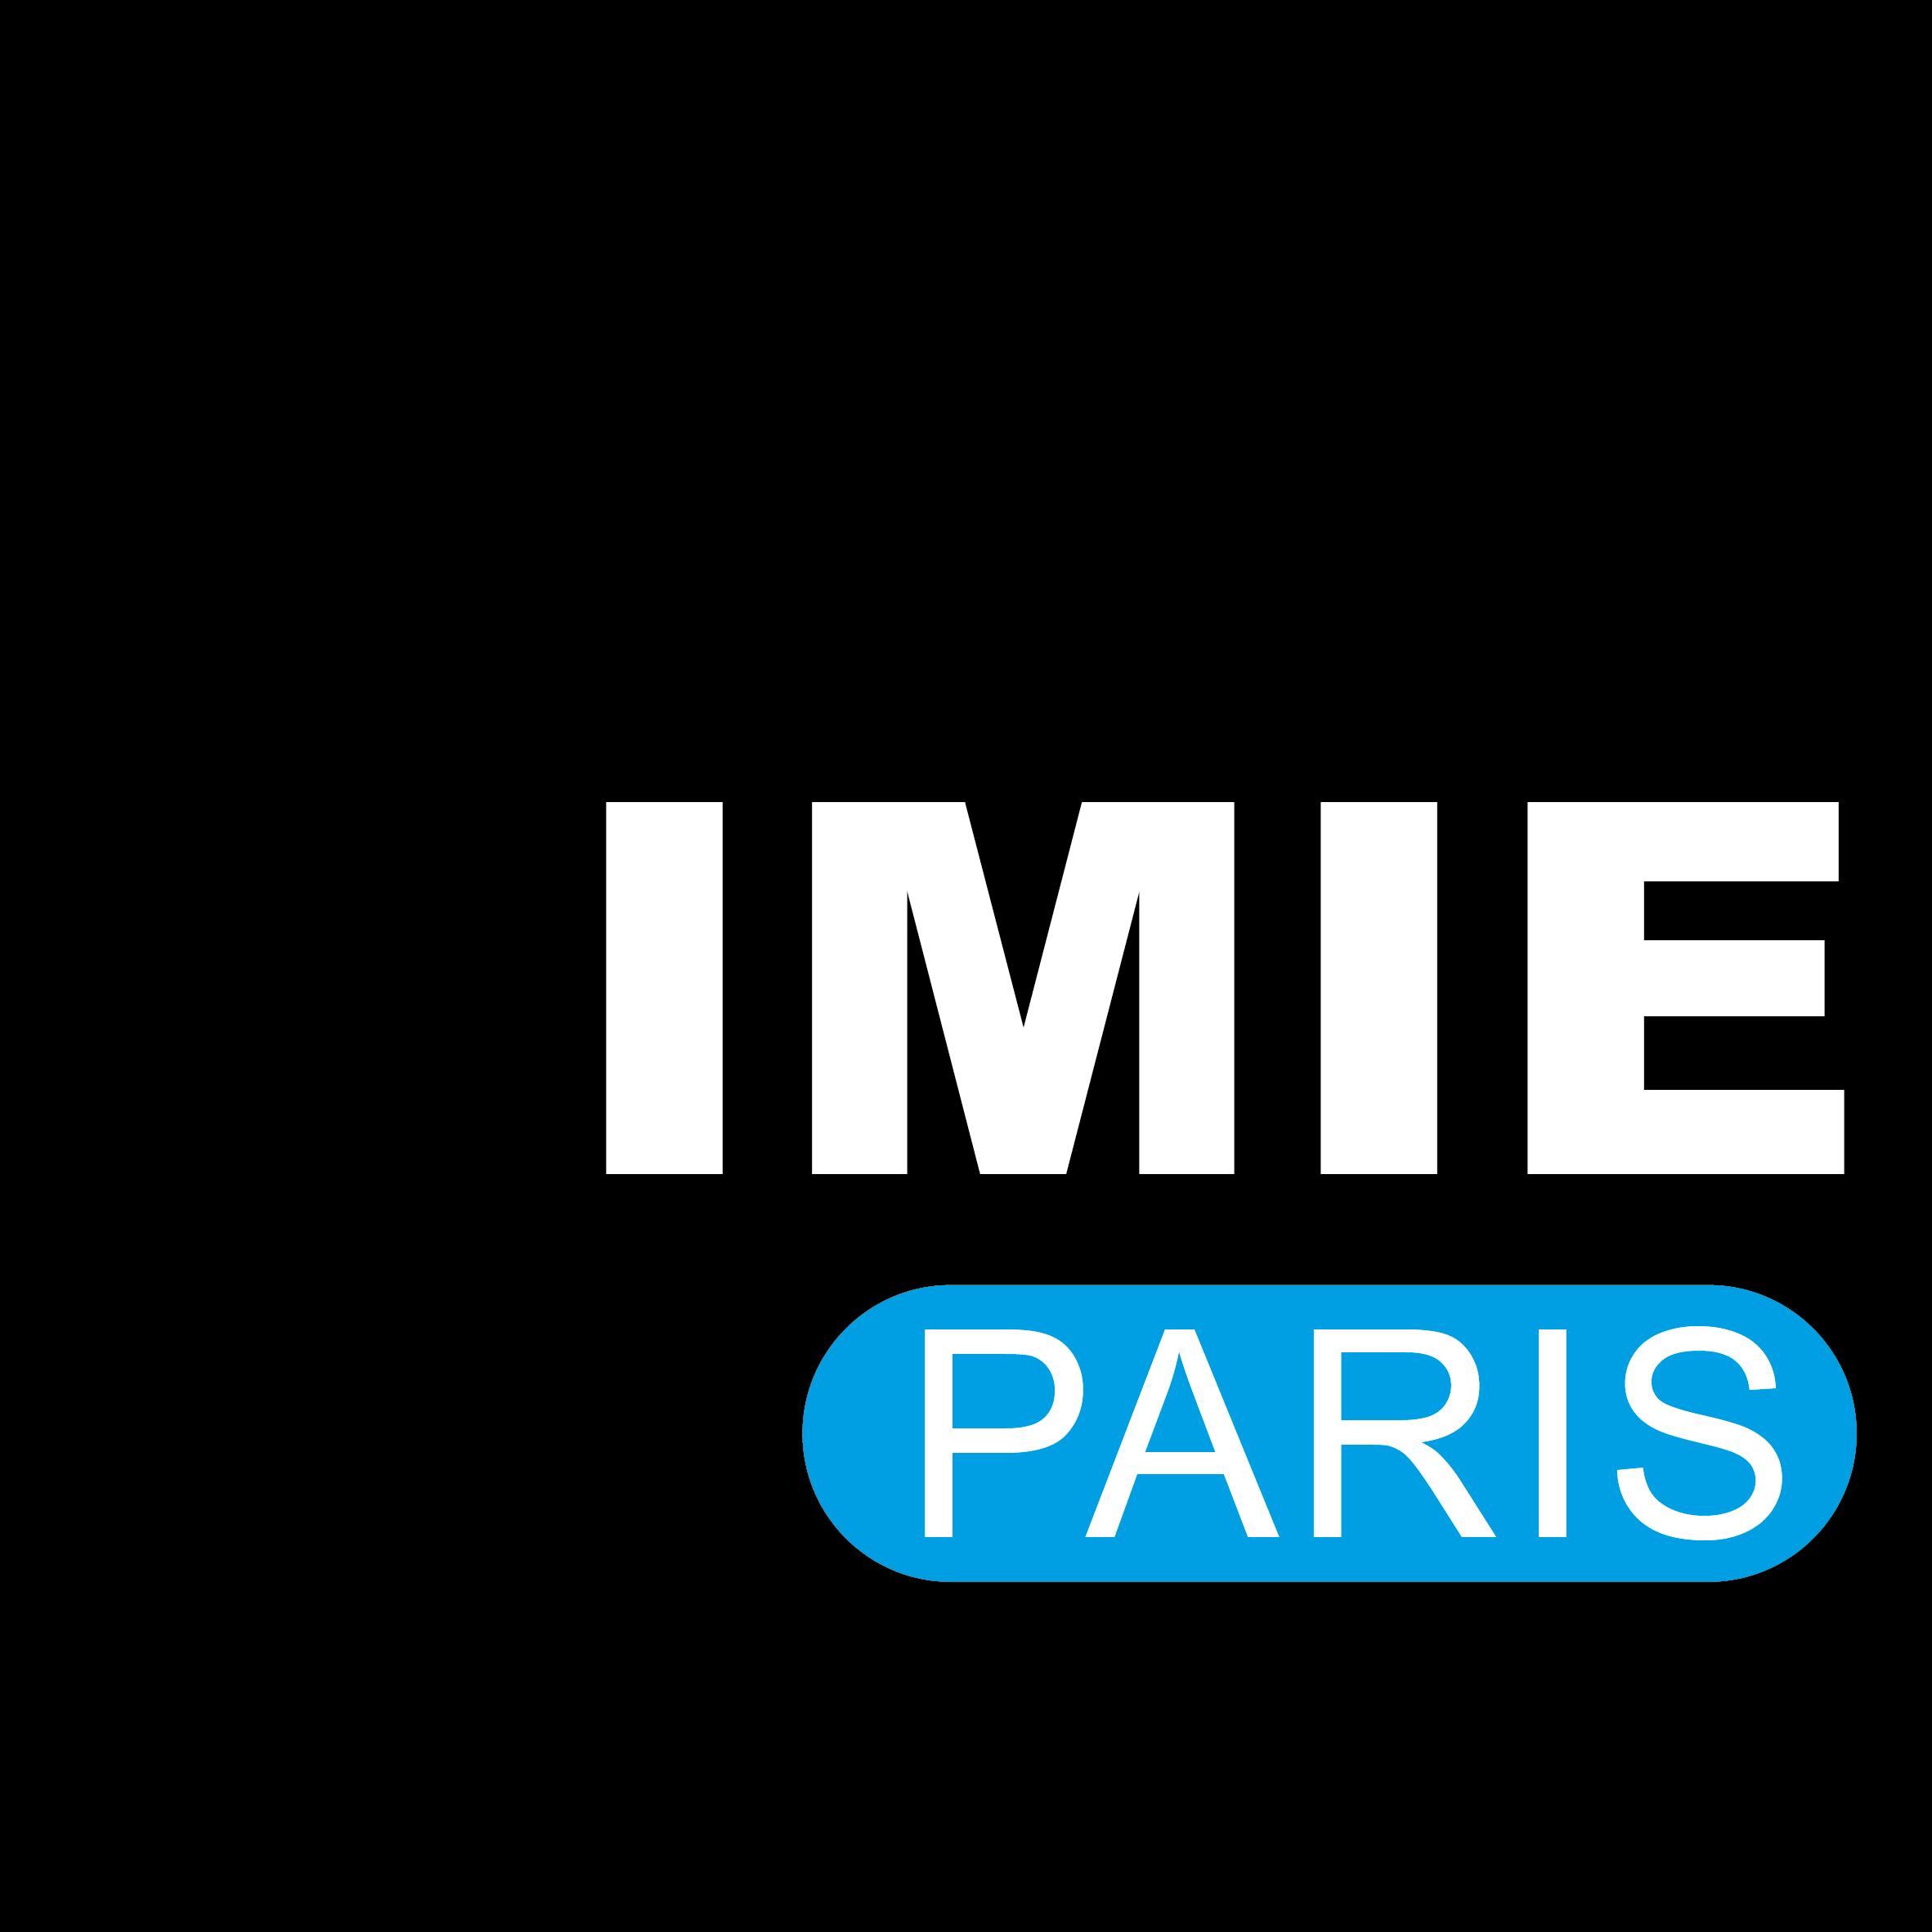 Logo de IMIE PARIS